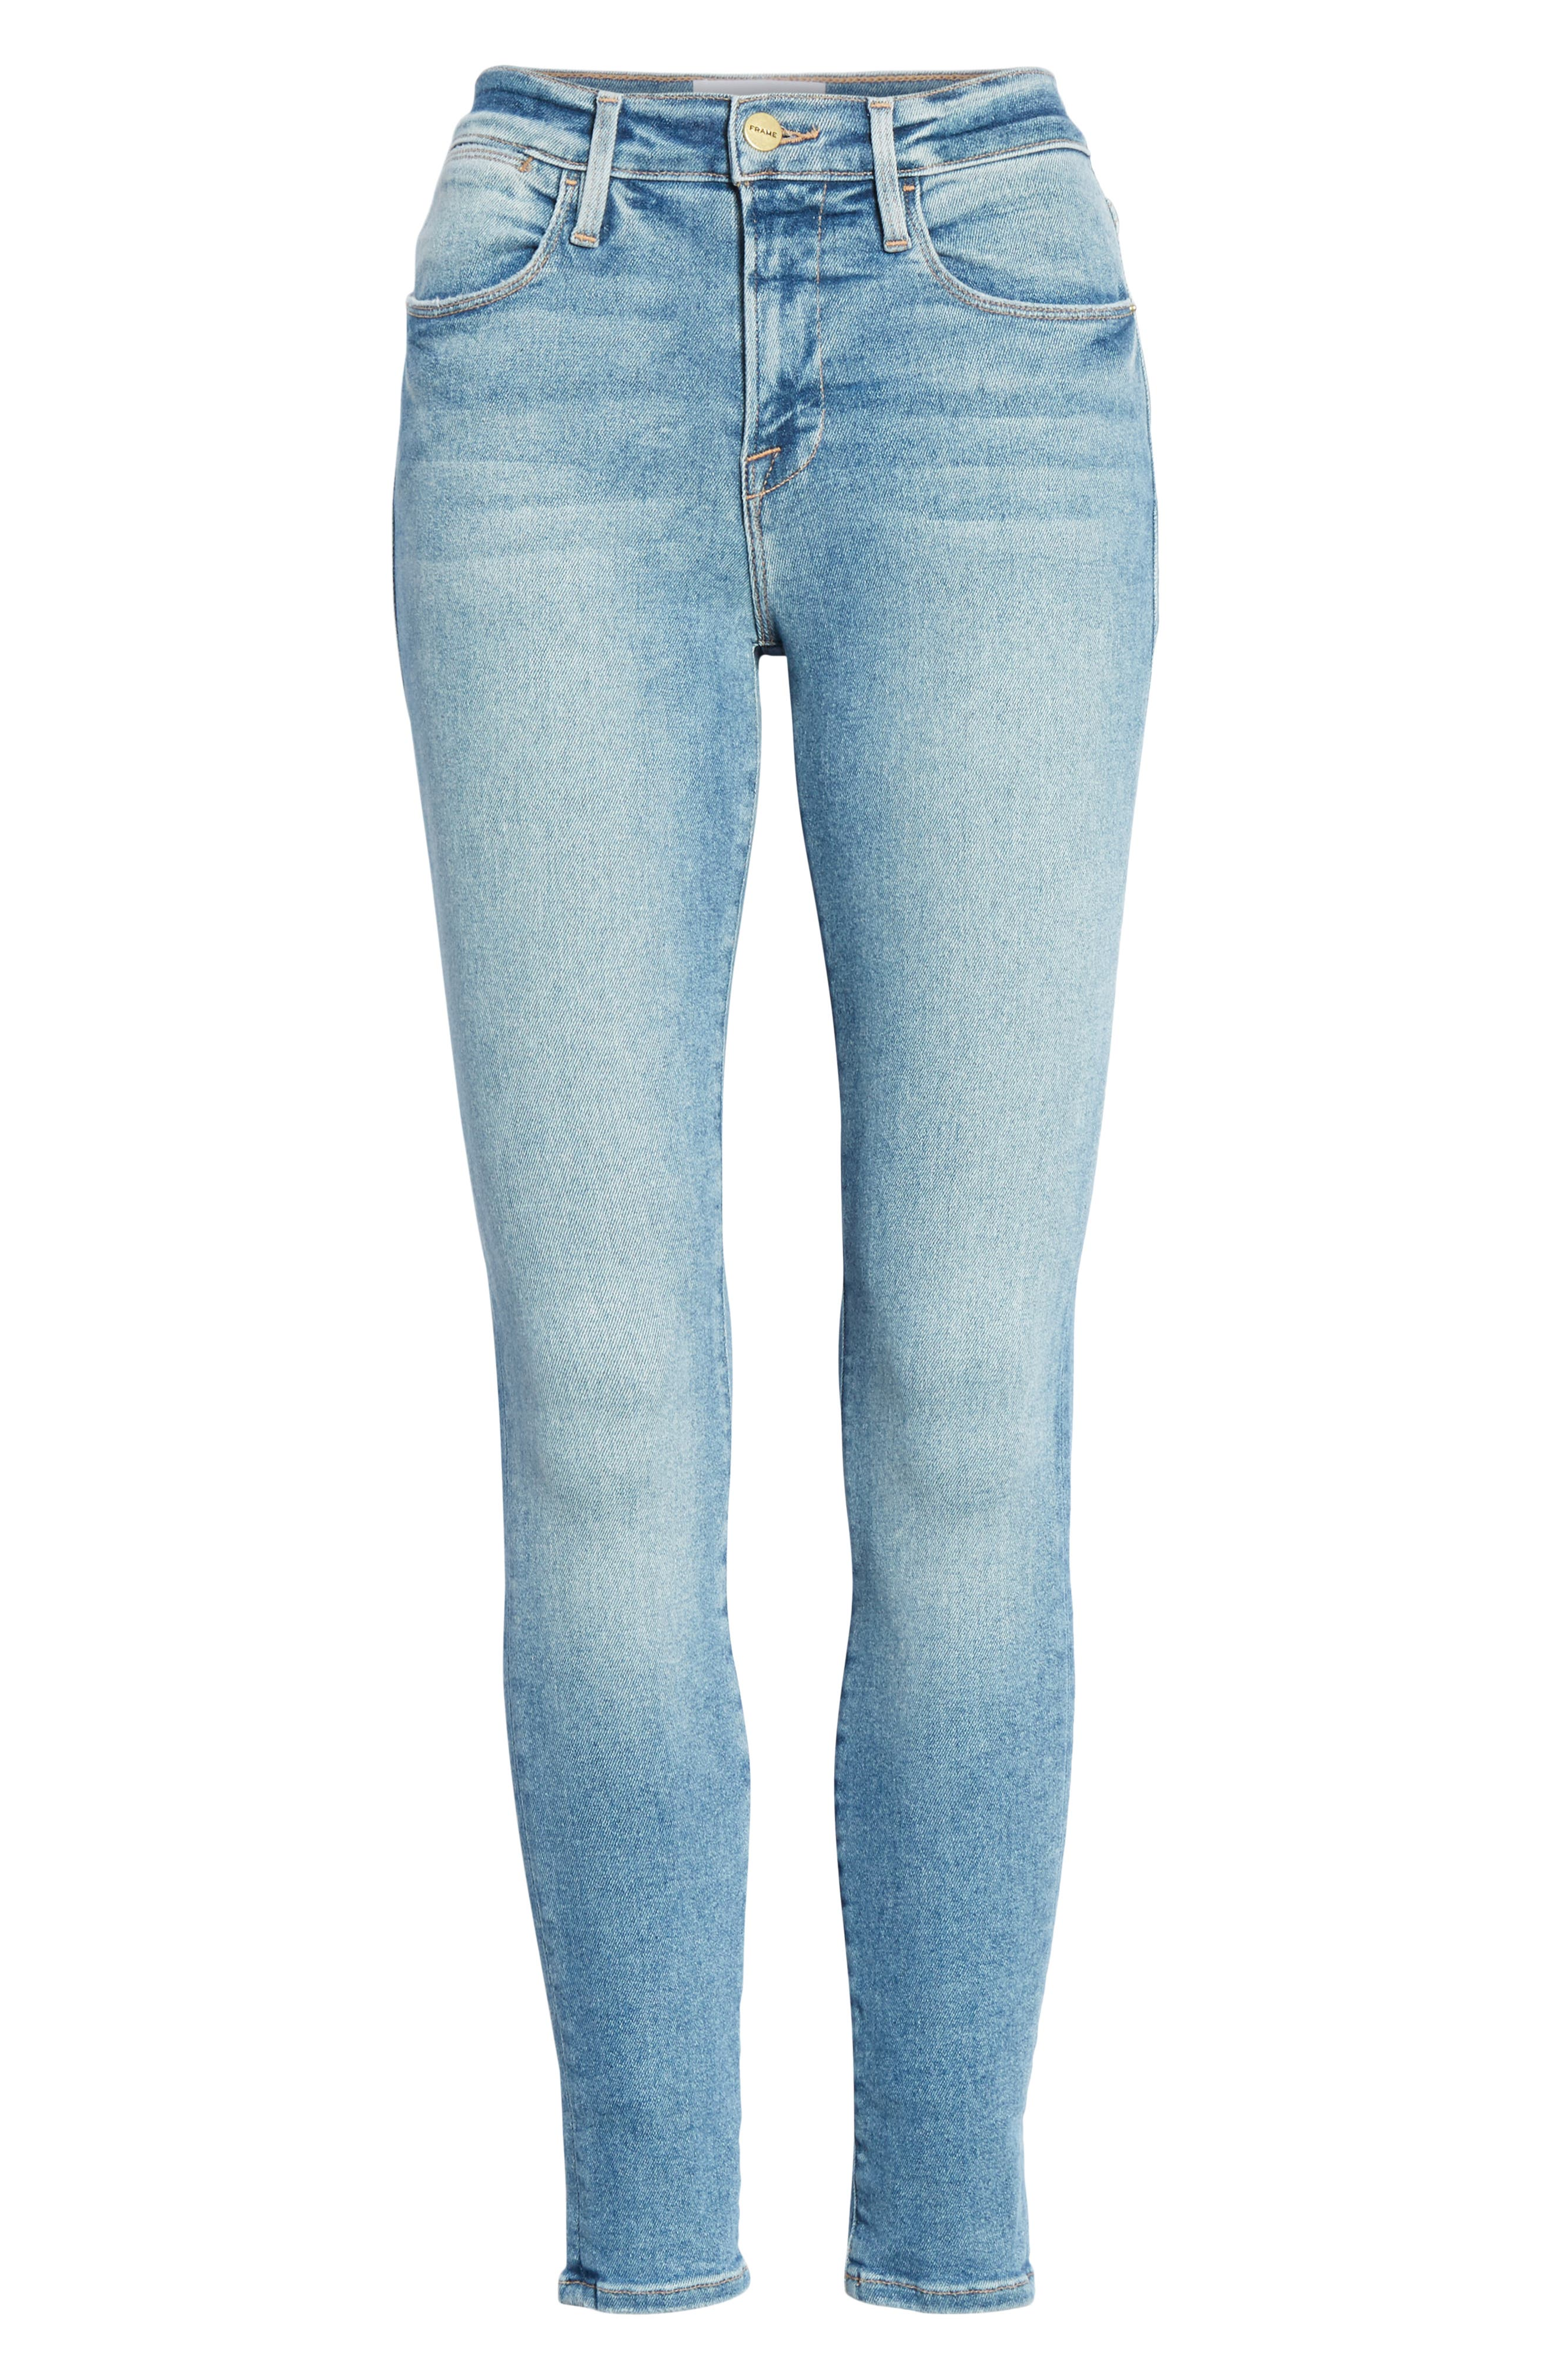 Le High Skinny Jeans,                             Alternate thumbnail 7, color,                             DUPONT DRIVE